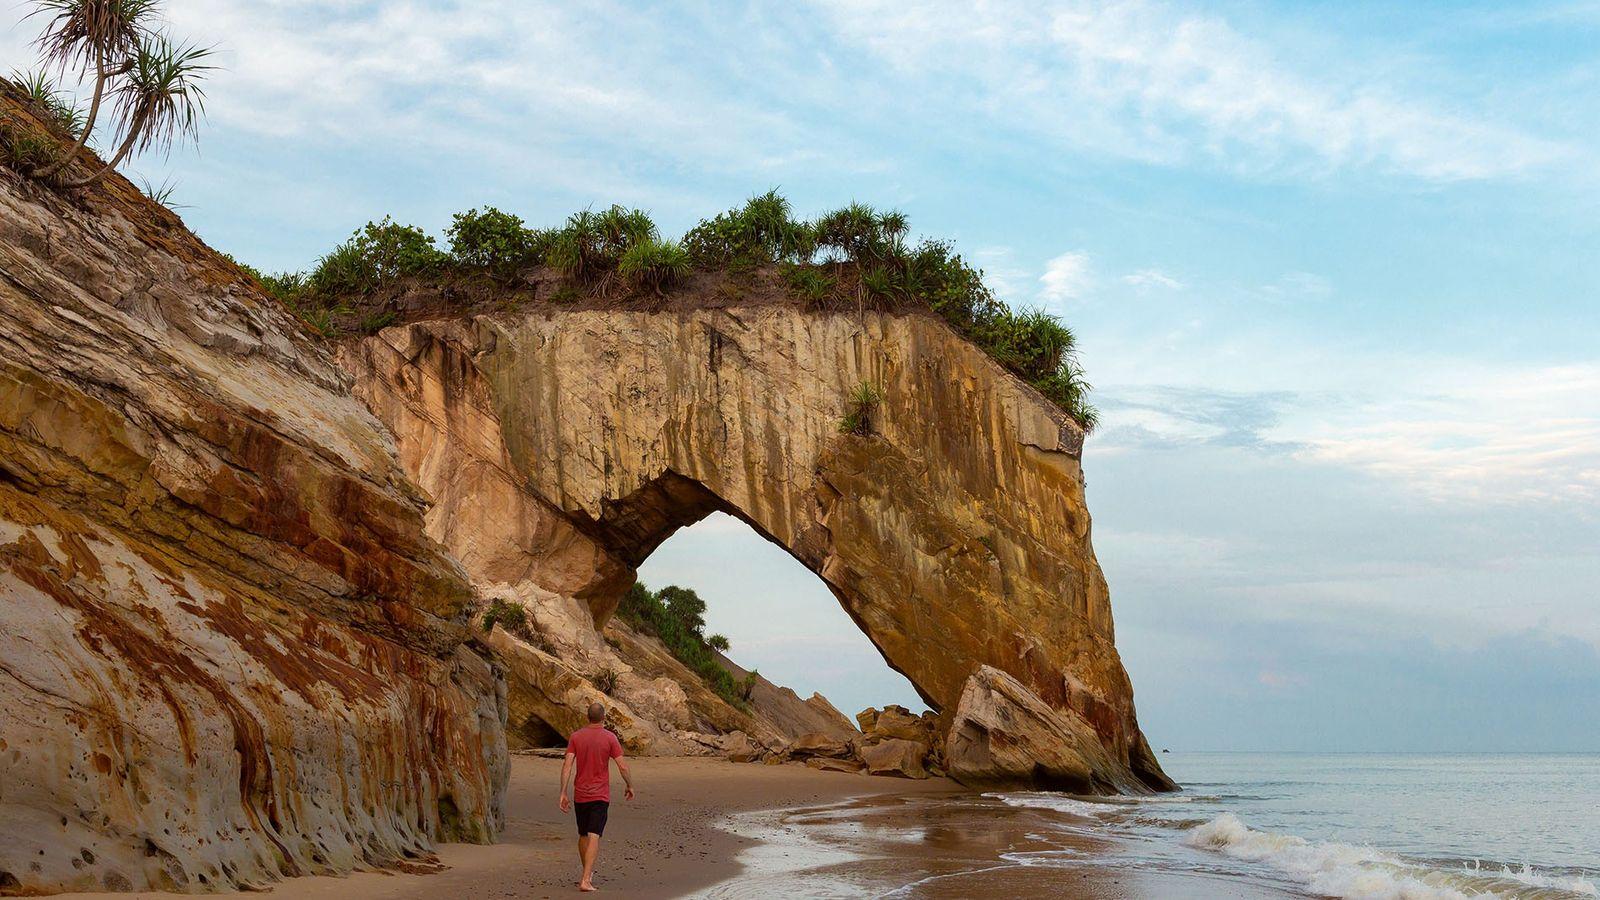 An hour from Miri is Tusan Beach, centring around the stunning Tusan Cliff. Here, lucky beachgoers ...